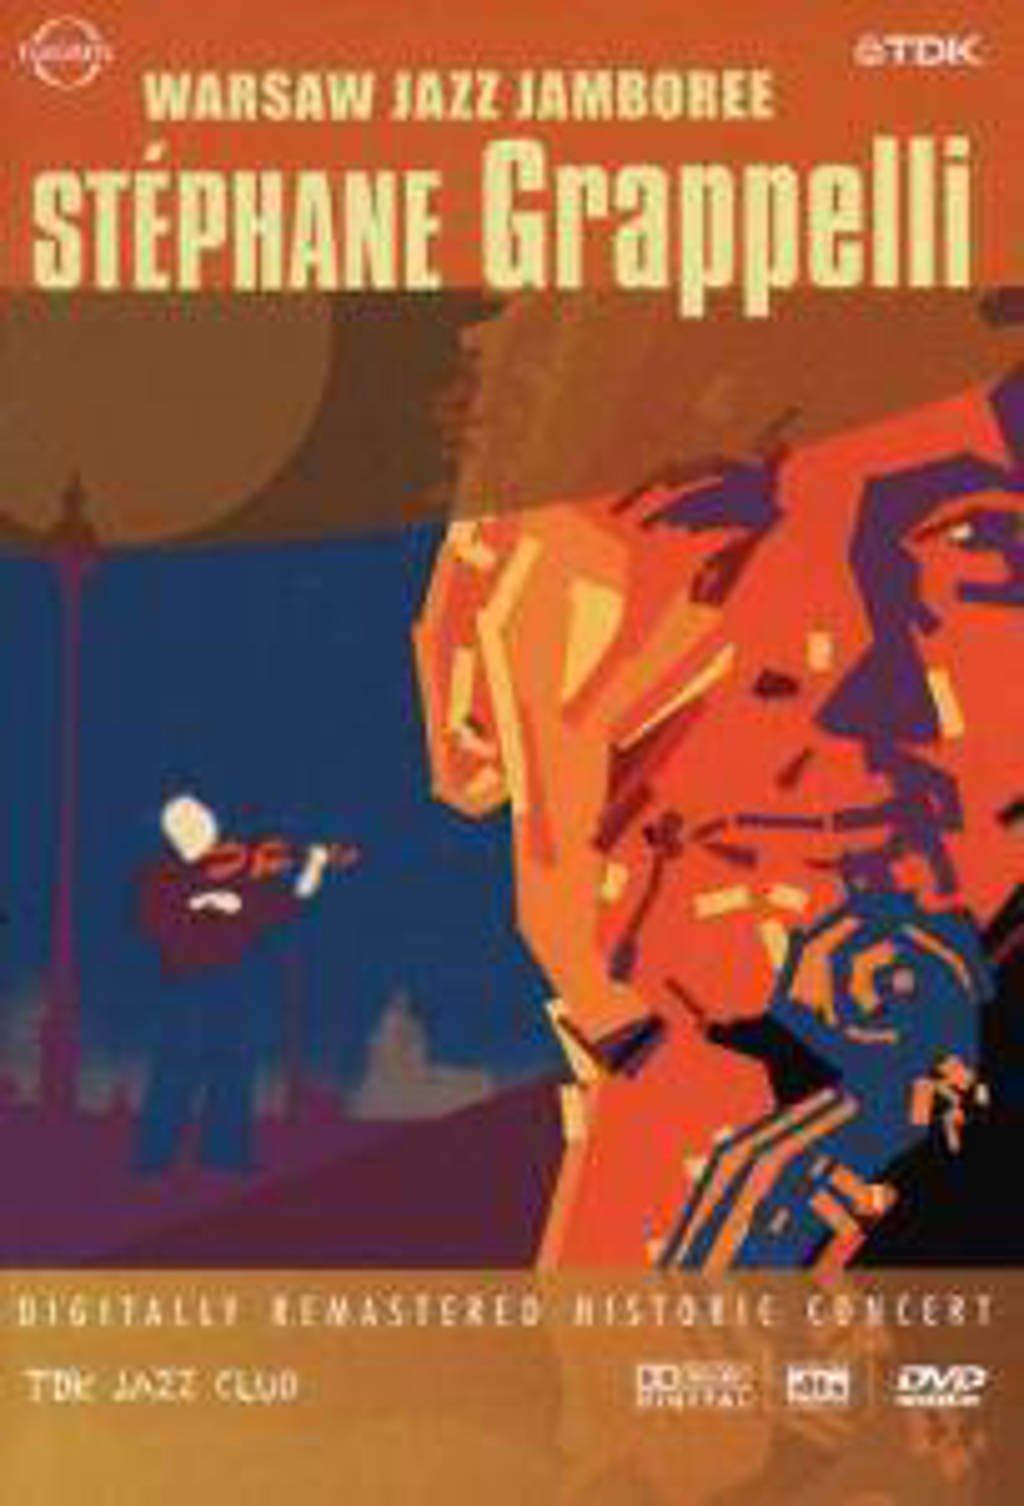 Stephane Grappelli (DVD)